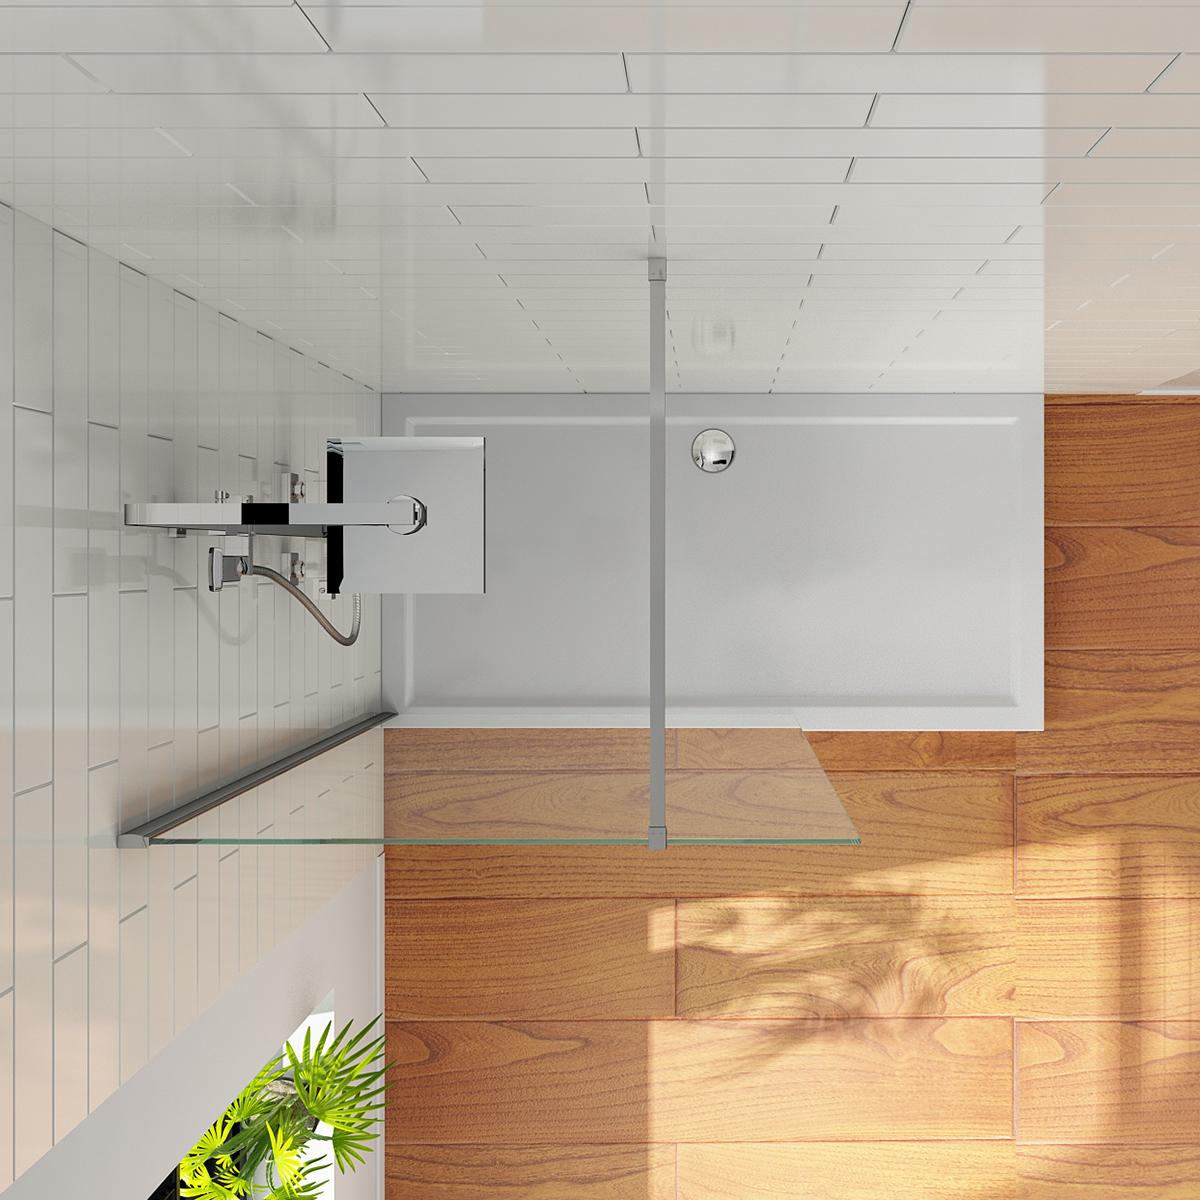 faltt r walk in duschabtrennung duschwand schiebet r duschkabine duscht r ebay. Black Bedroom Furniture Sets. Home Design Ideas